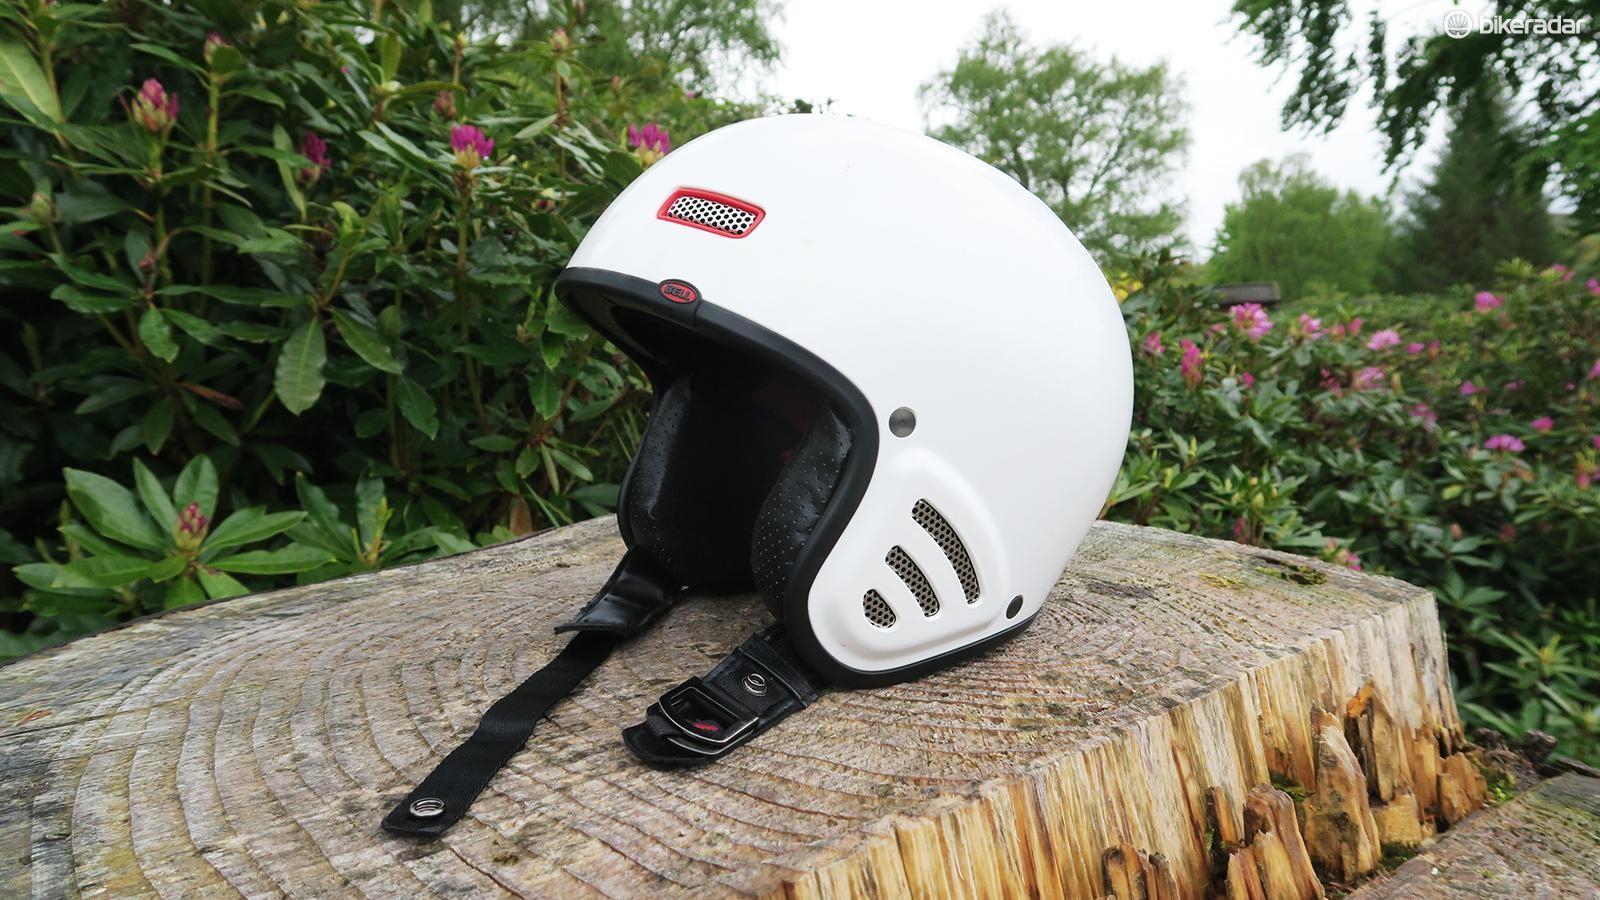 Bell Full Flex pisspot helmet